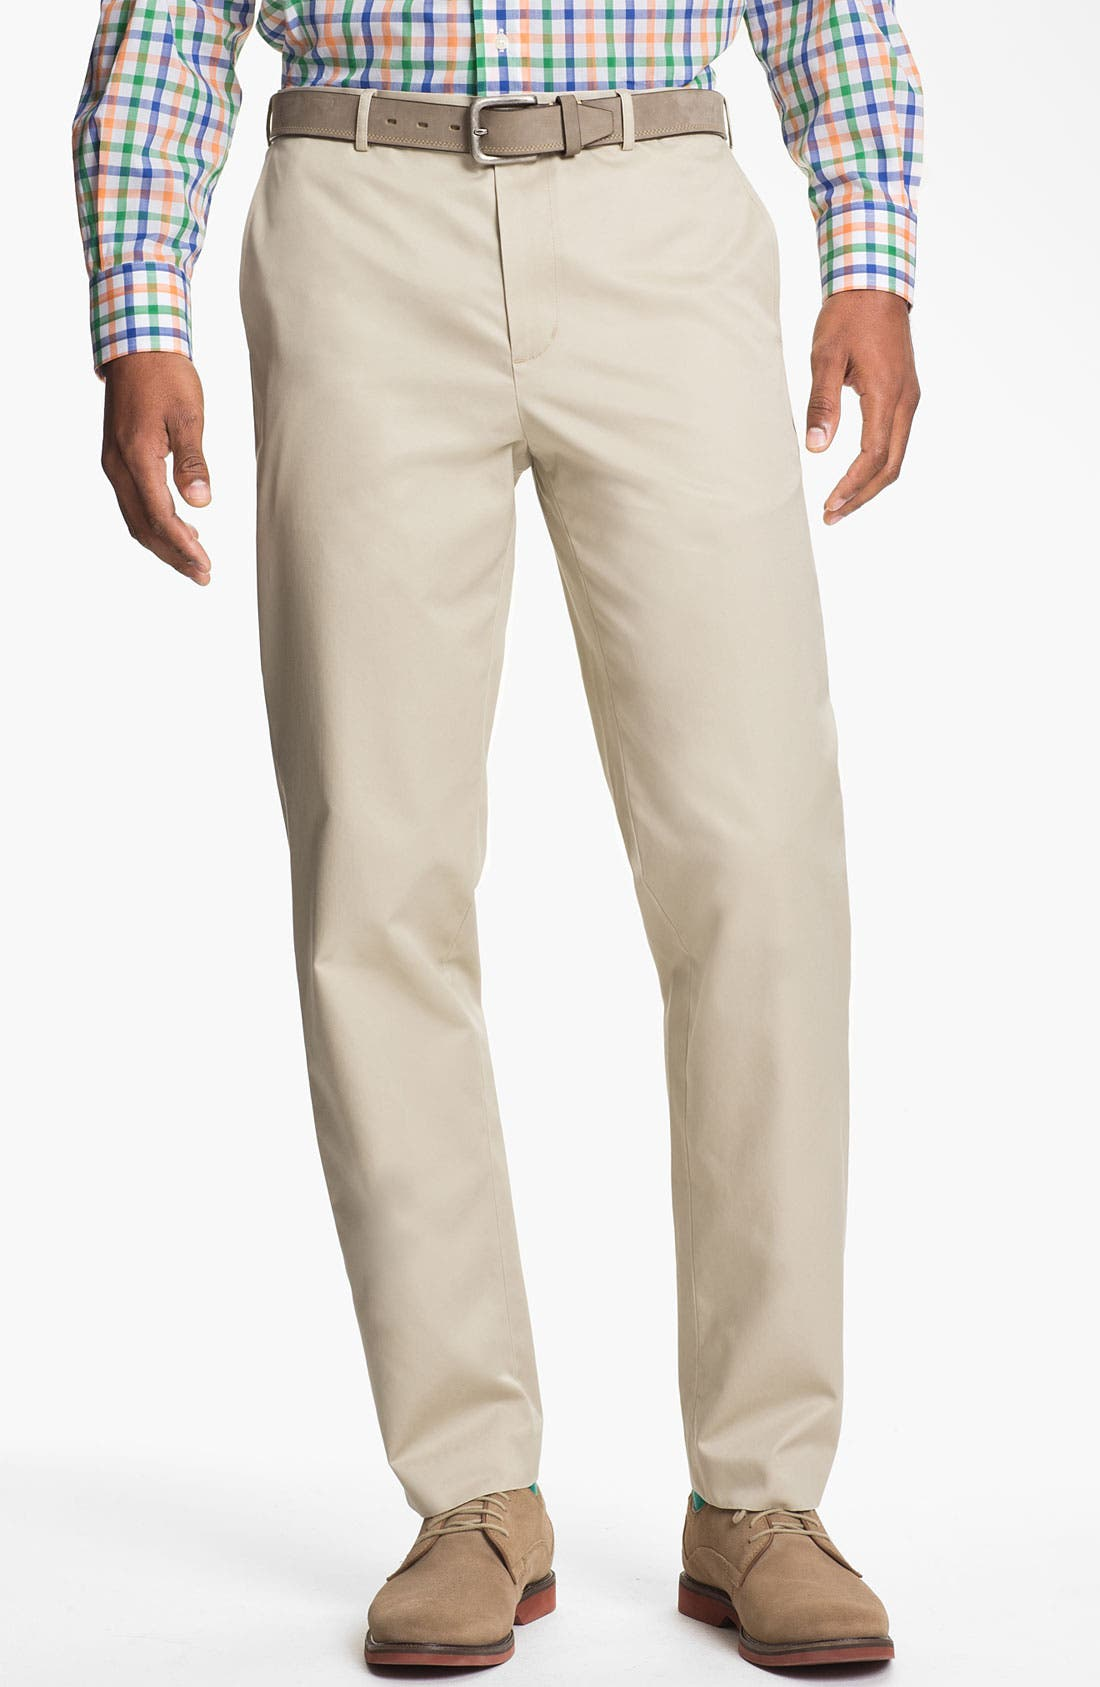 Alternate Image 1 Selected - Calibrate Flat Front Non-Iron Supima® Cotton Pants